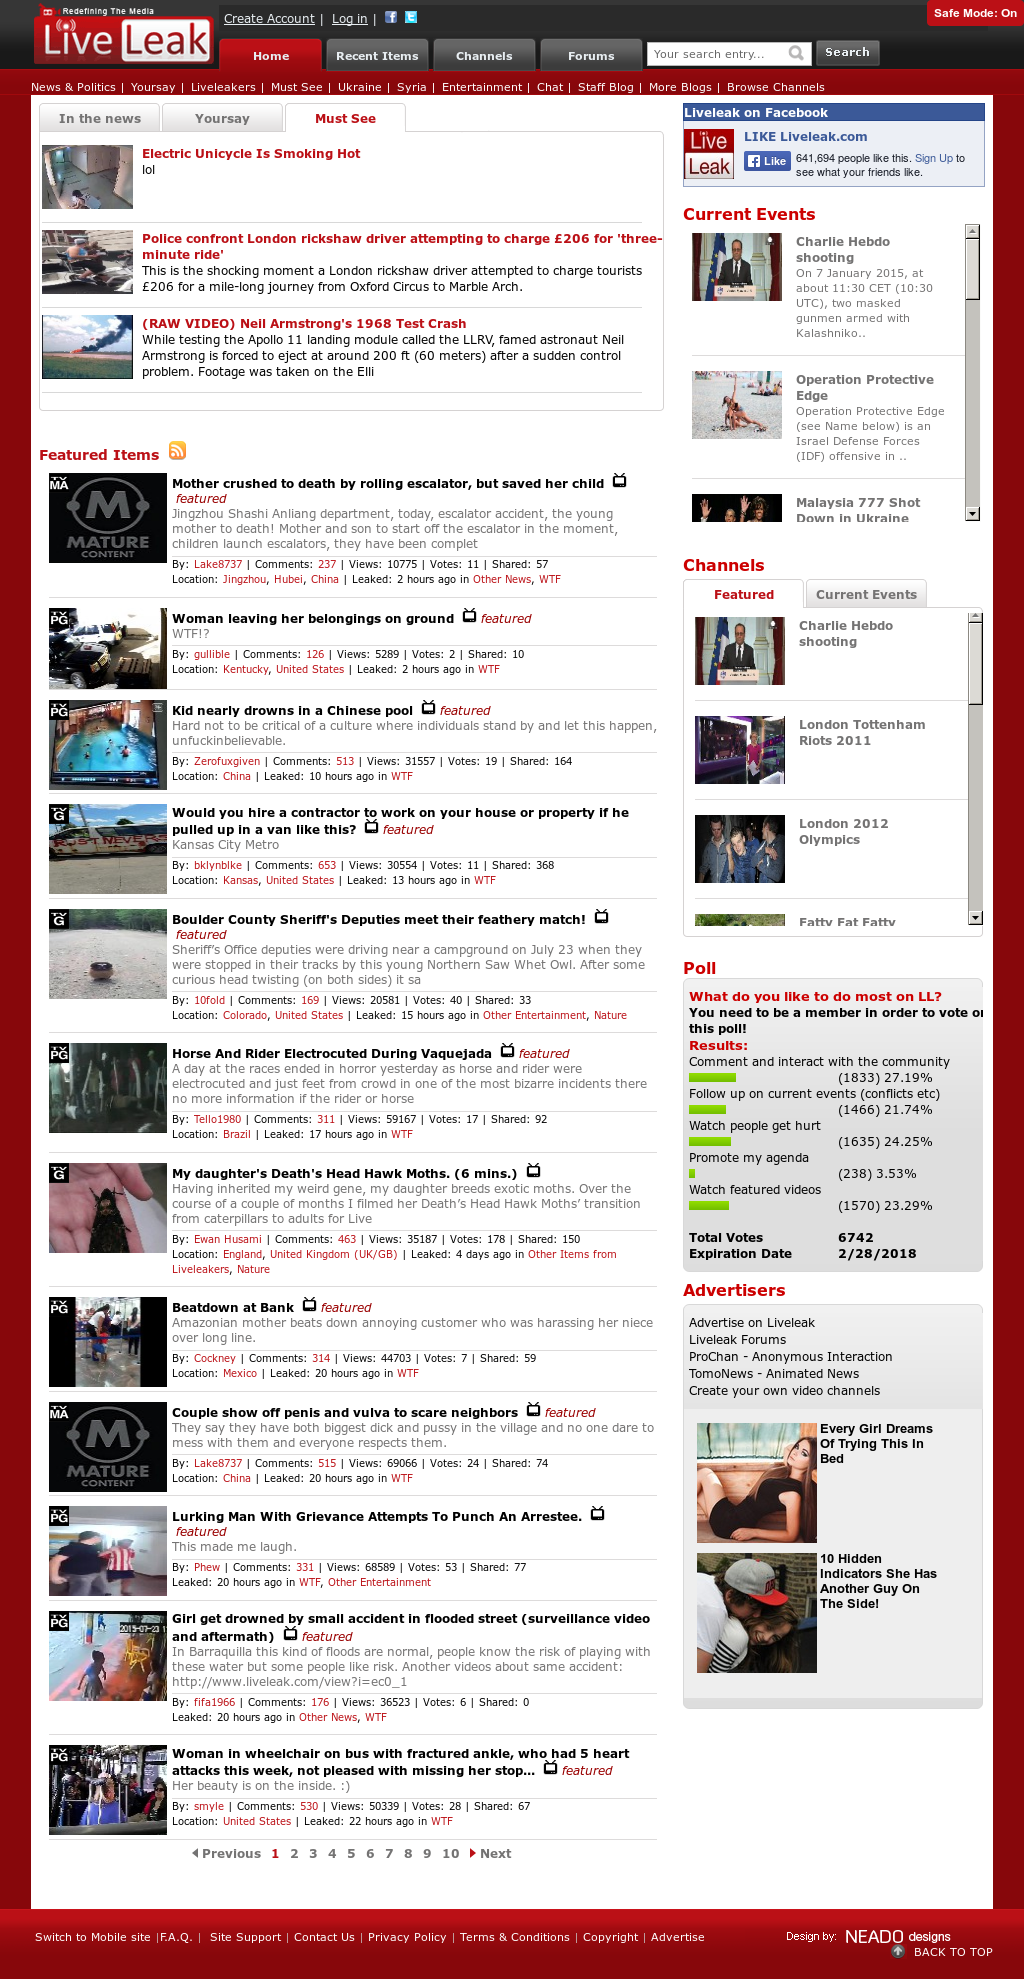 Liveleak Competitors, Revenue and Employees - Owler Company Profile